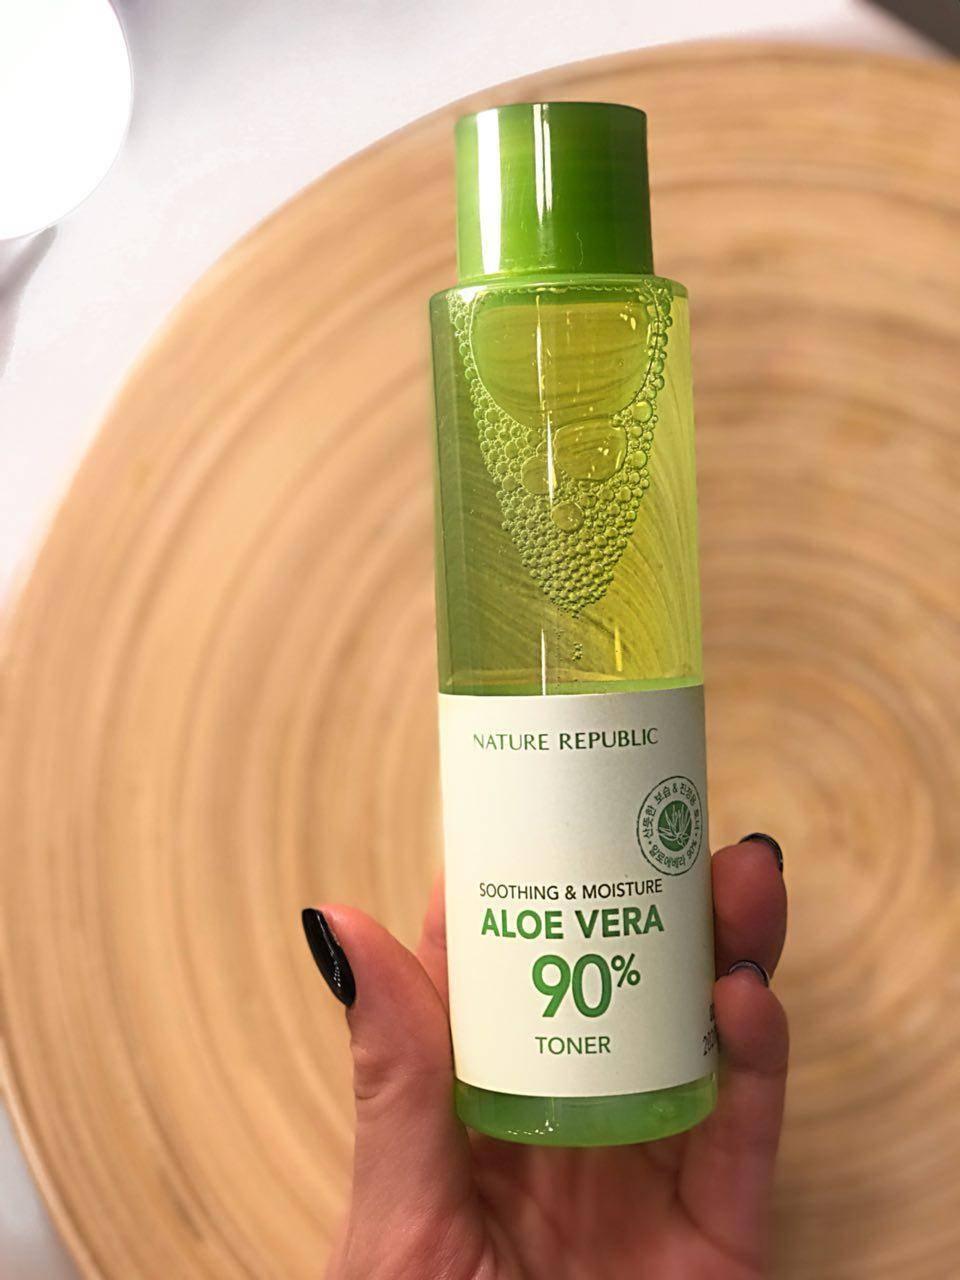 Тонер Увлажняющий С Экстрактом Алое Nature Republic Soothing & Moisture Aloe Vera 90% Toner